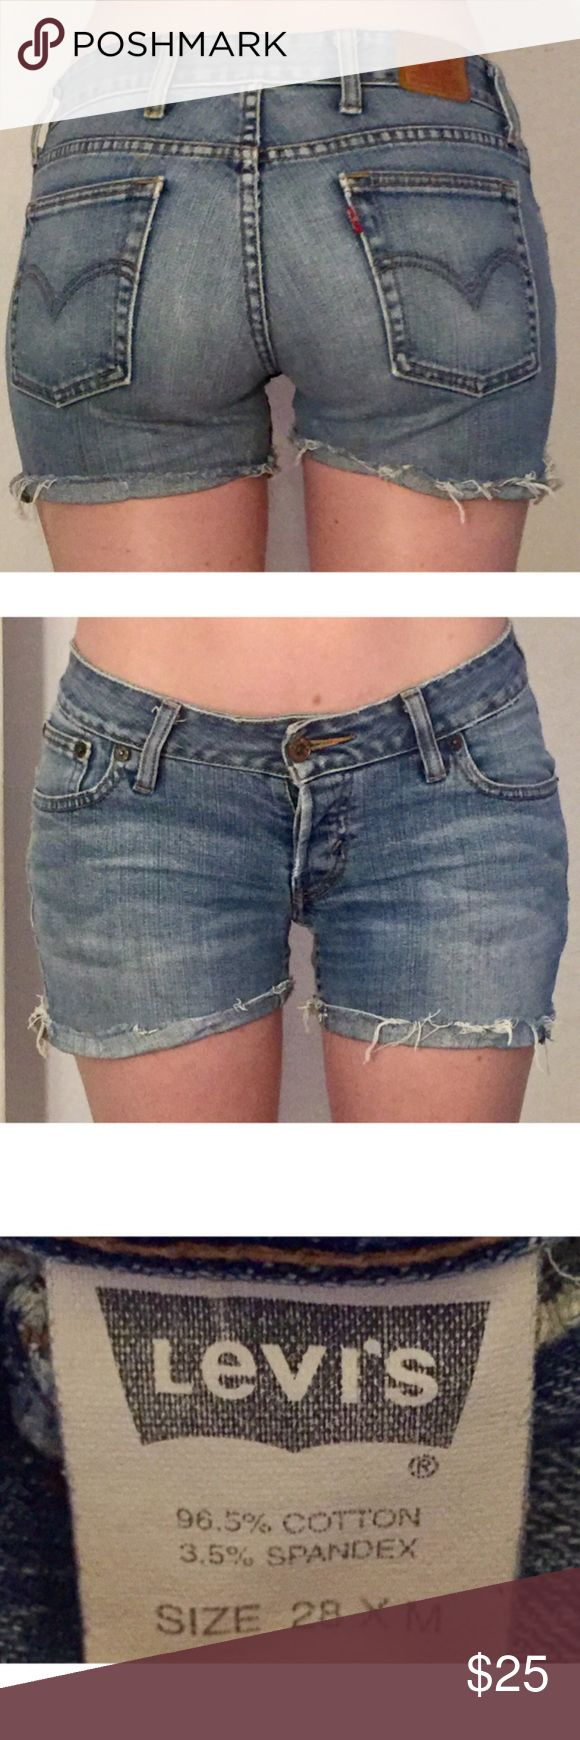 Levi's cutoff jean shorts Levi's cutoff jean shorts Levi's Shorts Jean Shorts